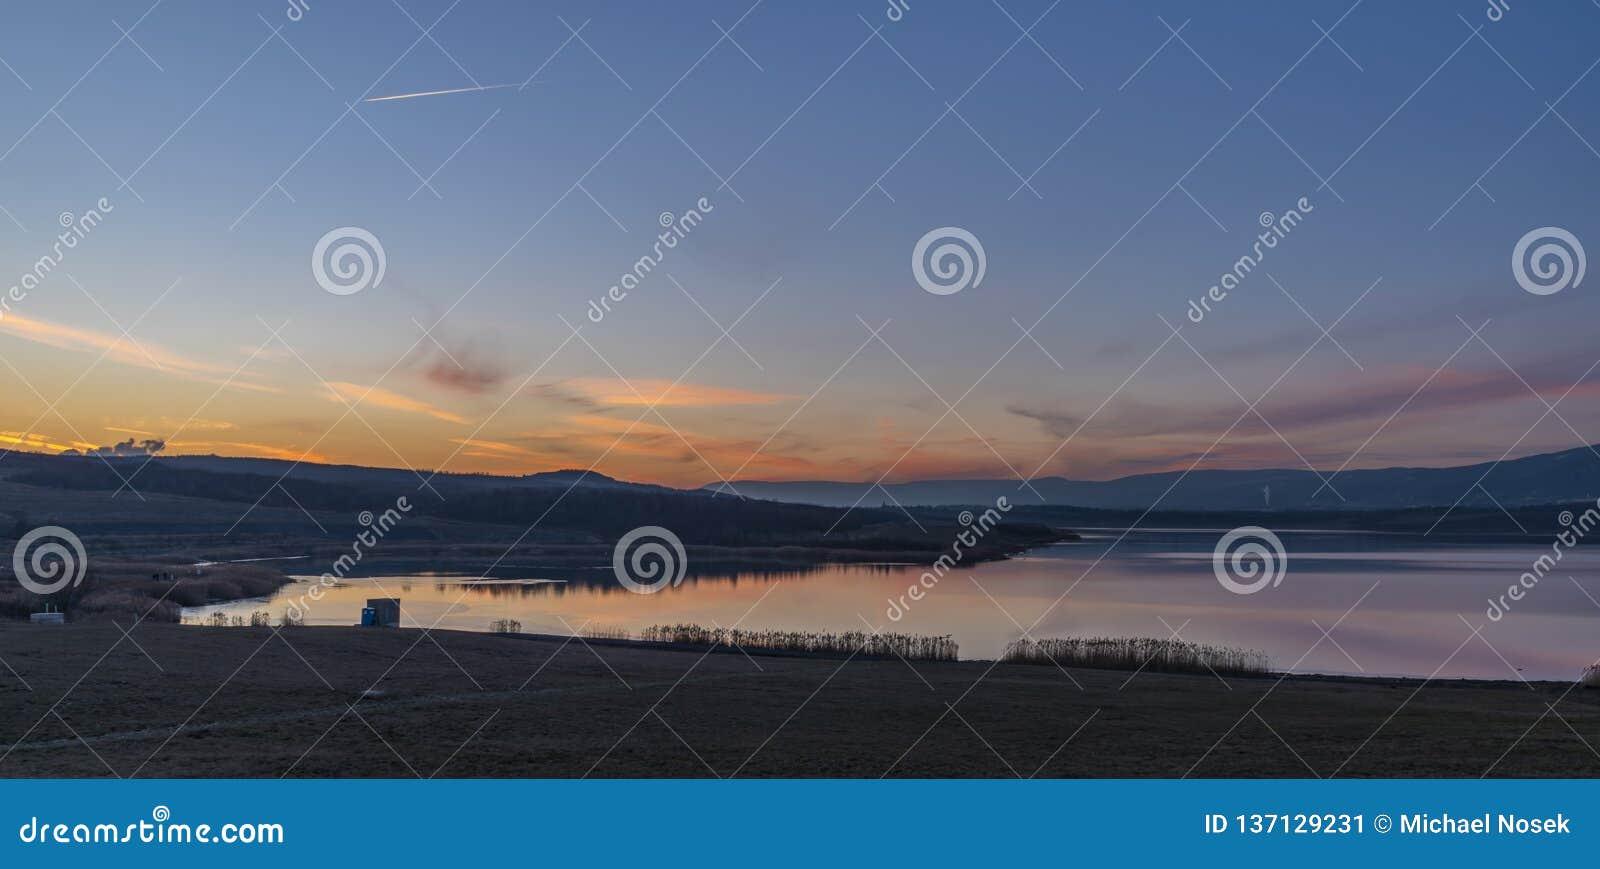 Milada lake in winter cold evening in north Bohemia